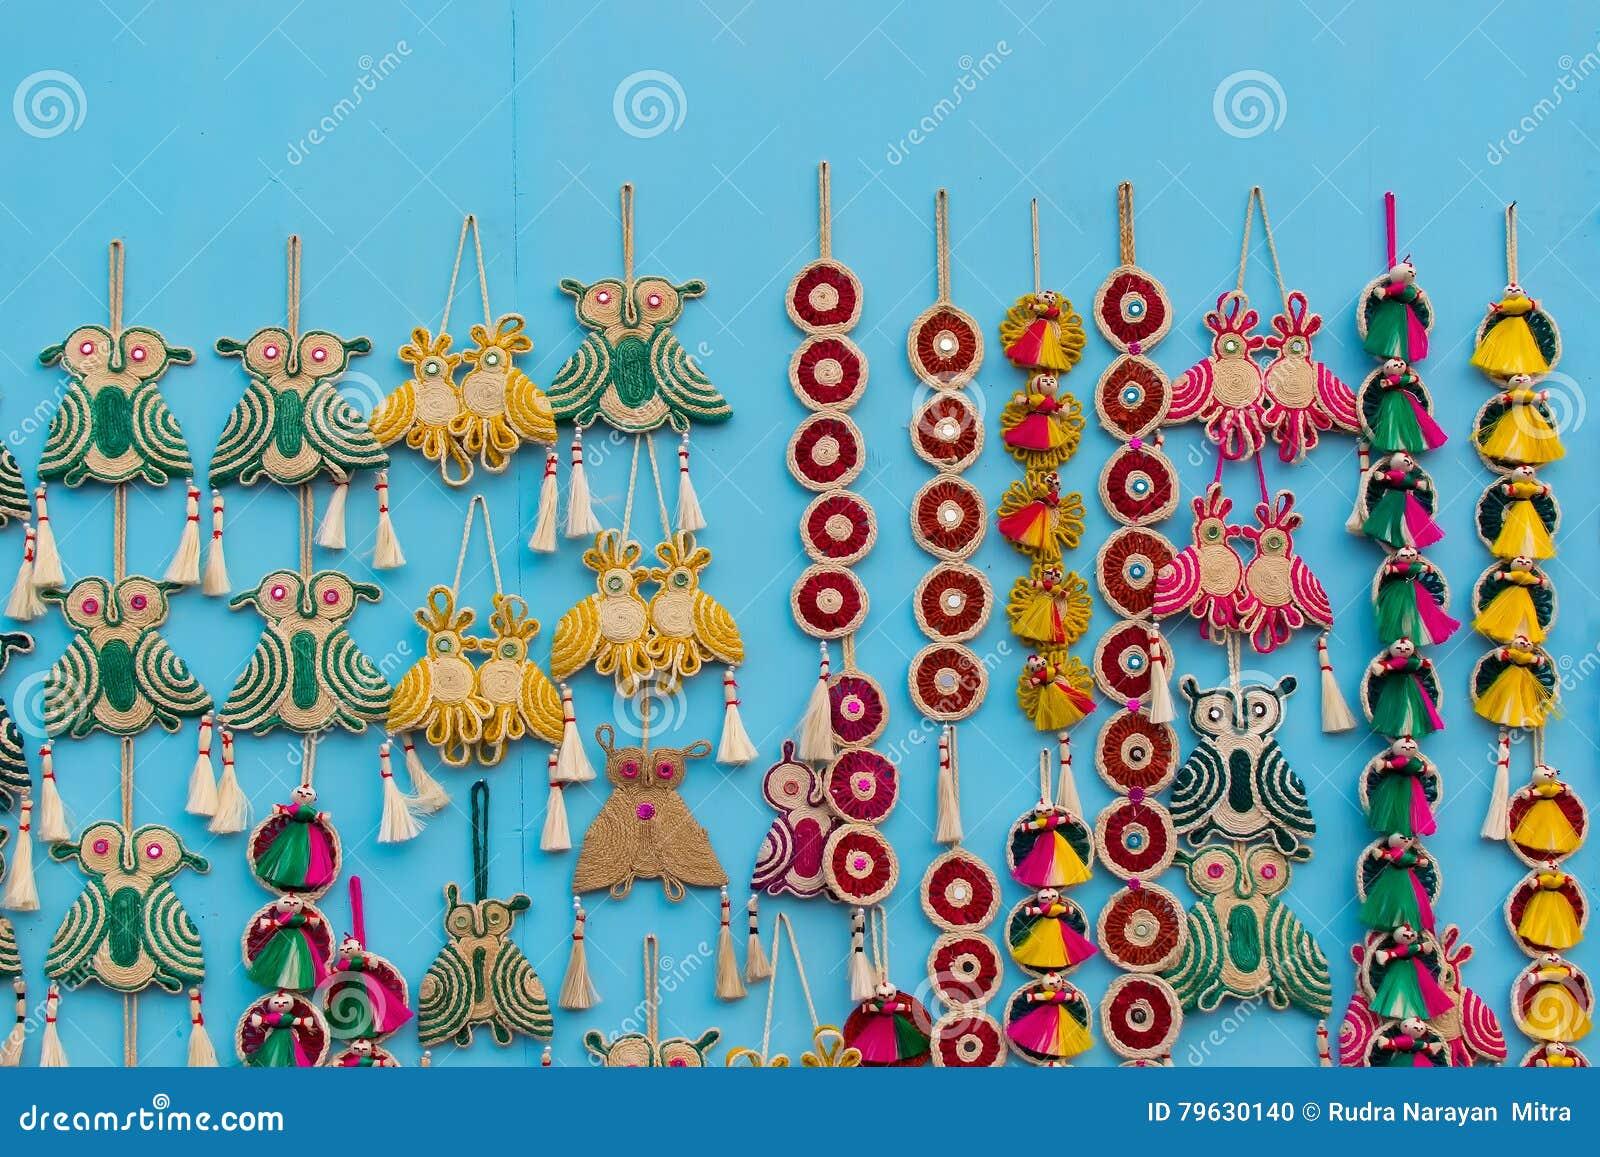 Art Work Indian Handicrafts Fair At Kolkata Editorial Image